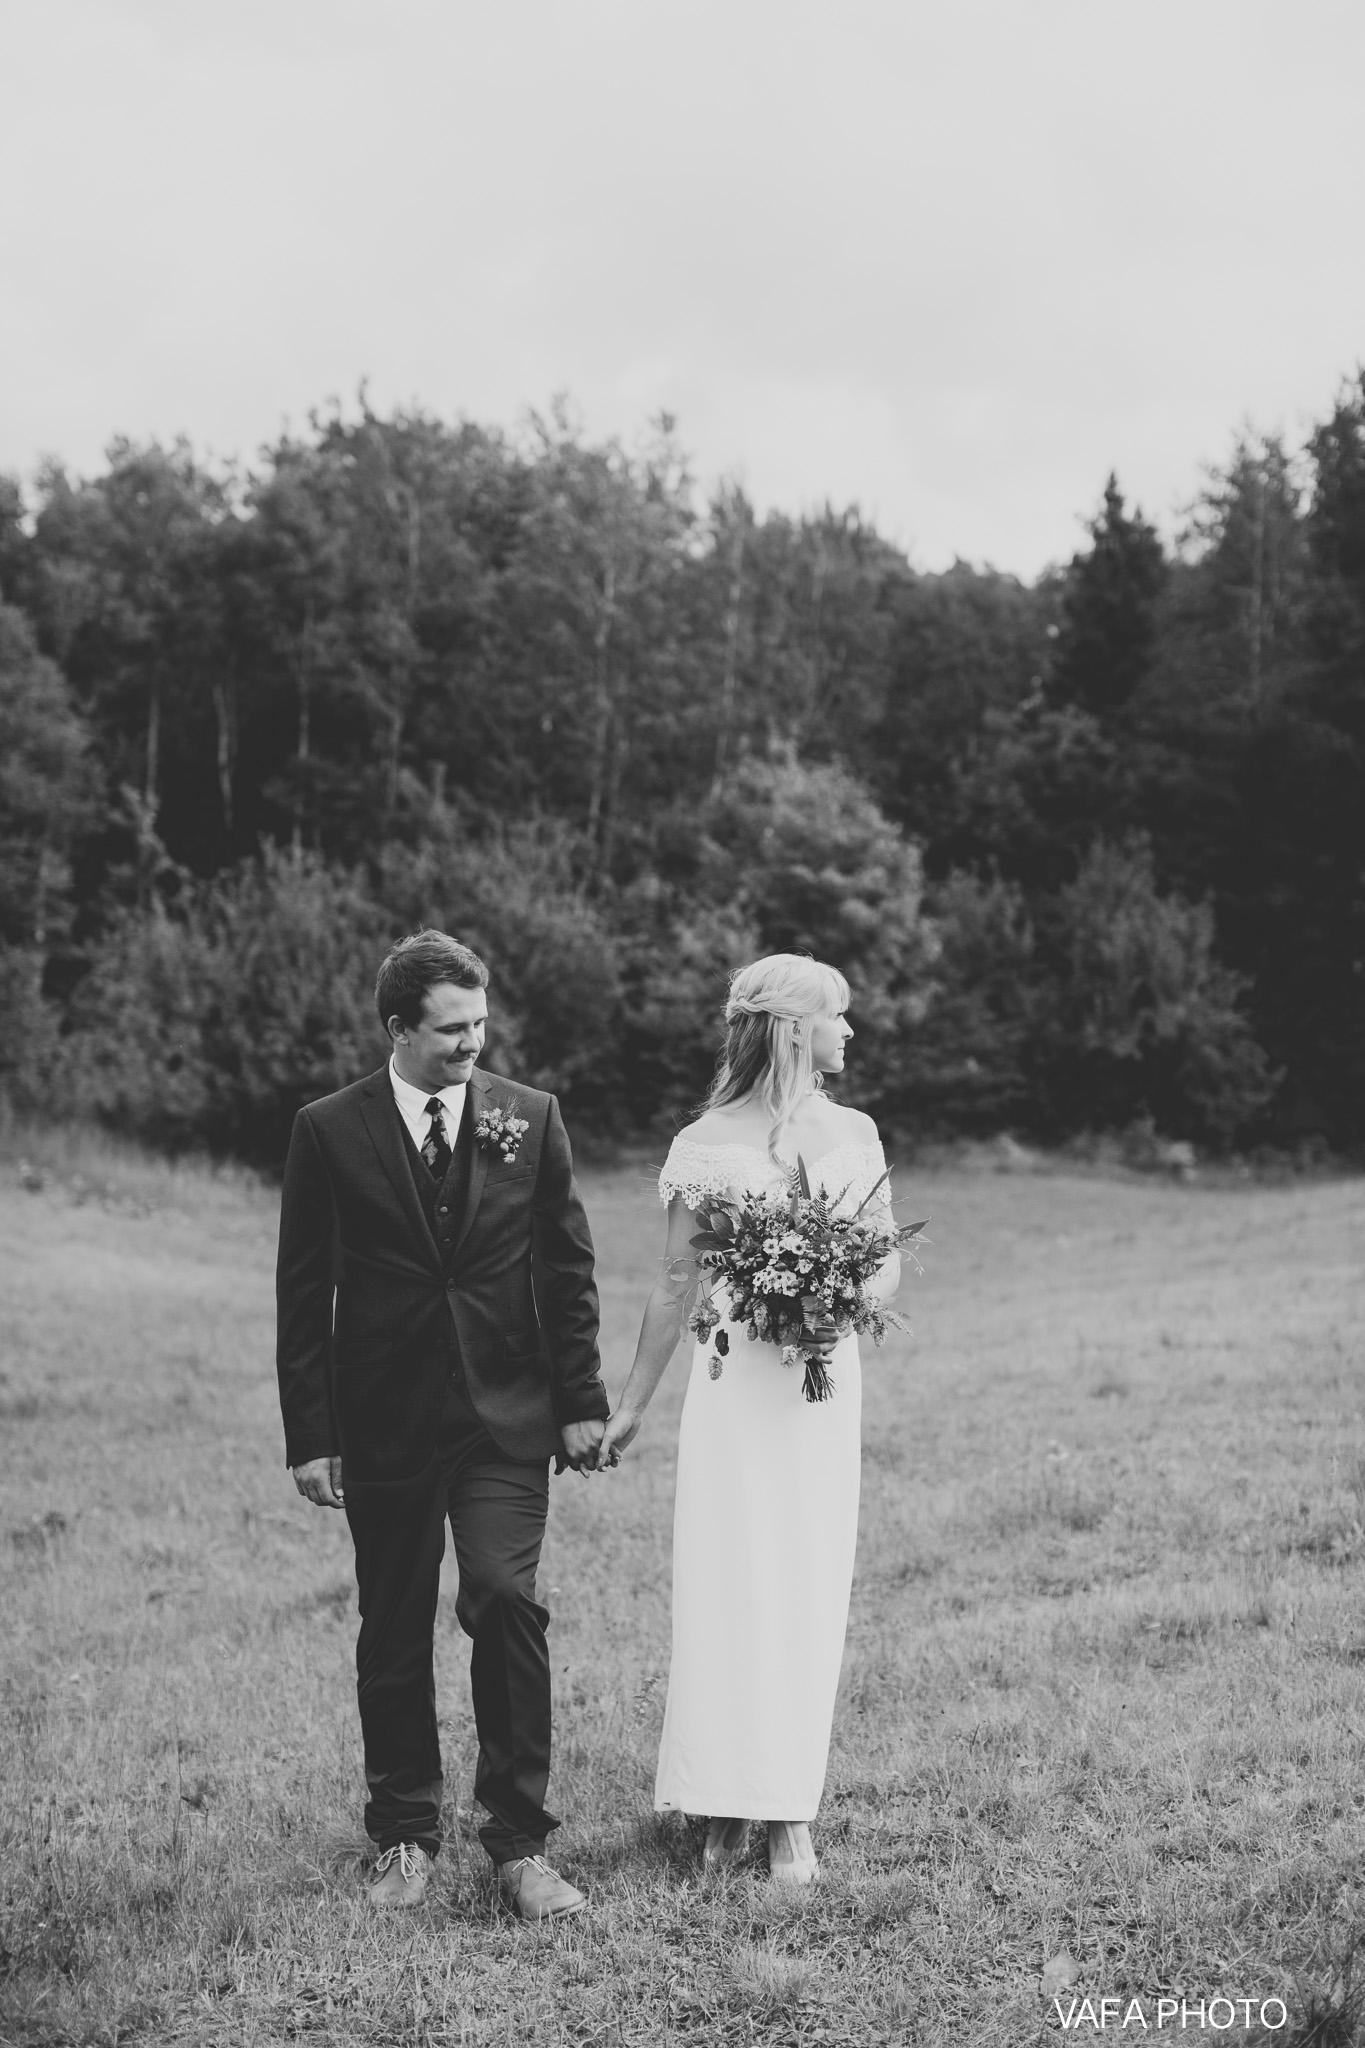 Belsolda-Farm-Wedding-Christy-Eric-Vafa-Photo-169.jpg